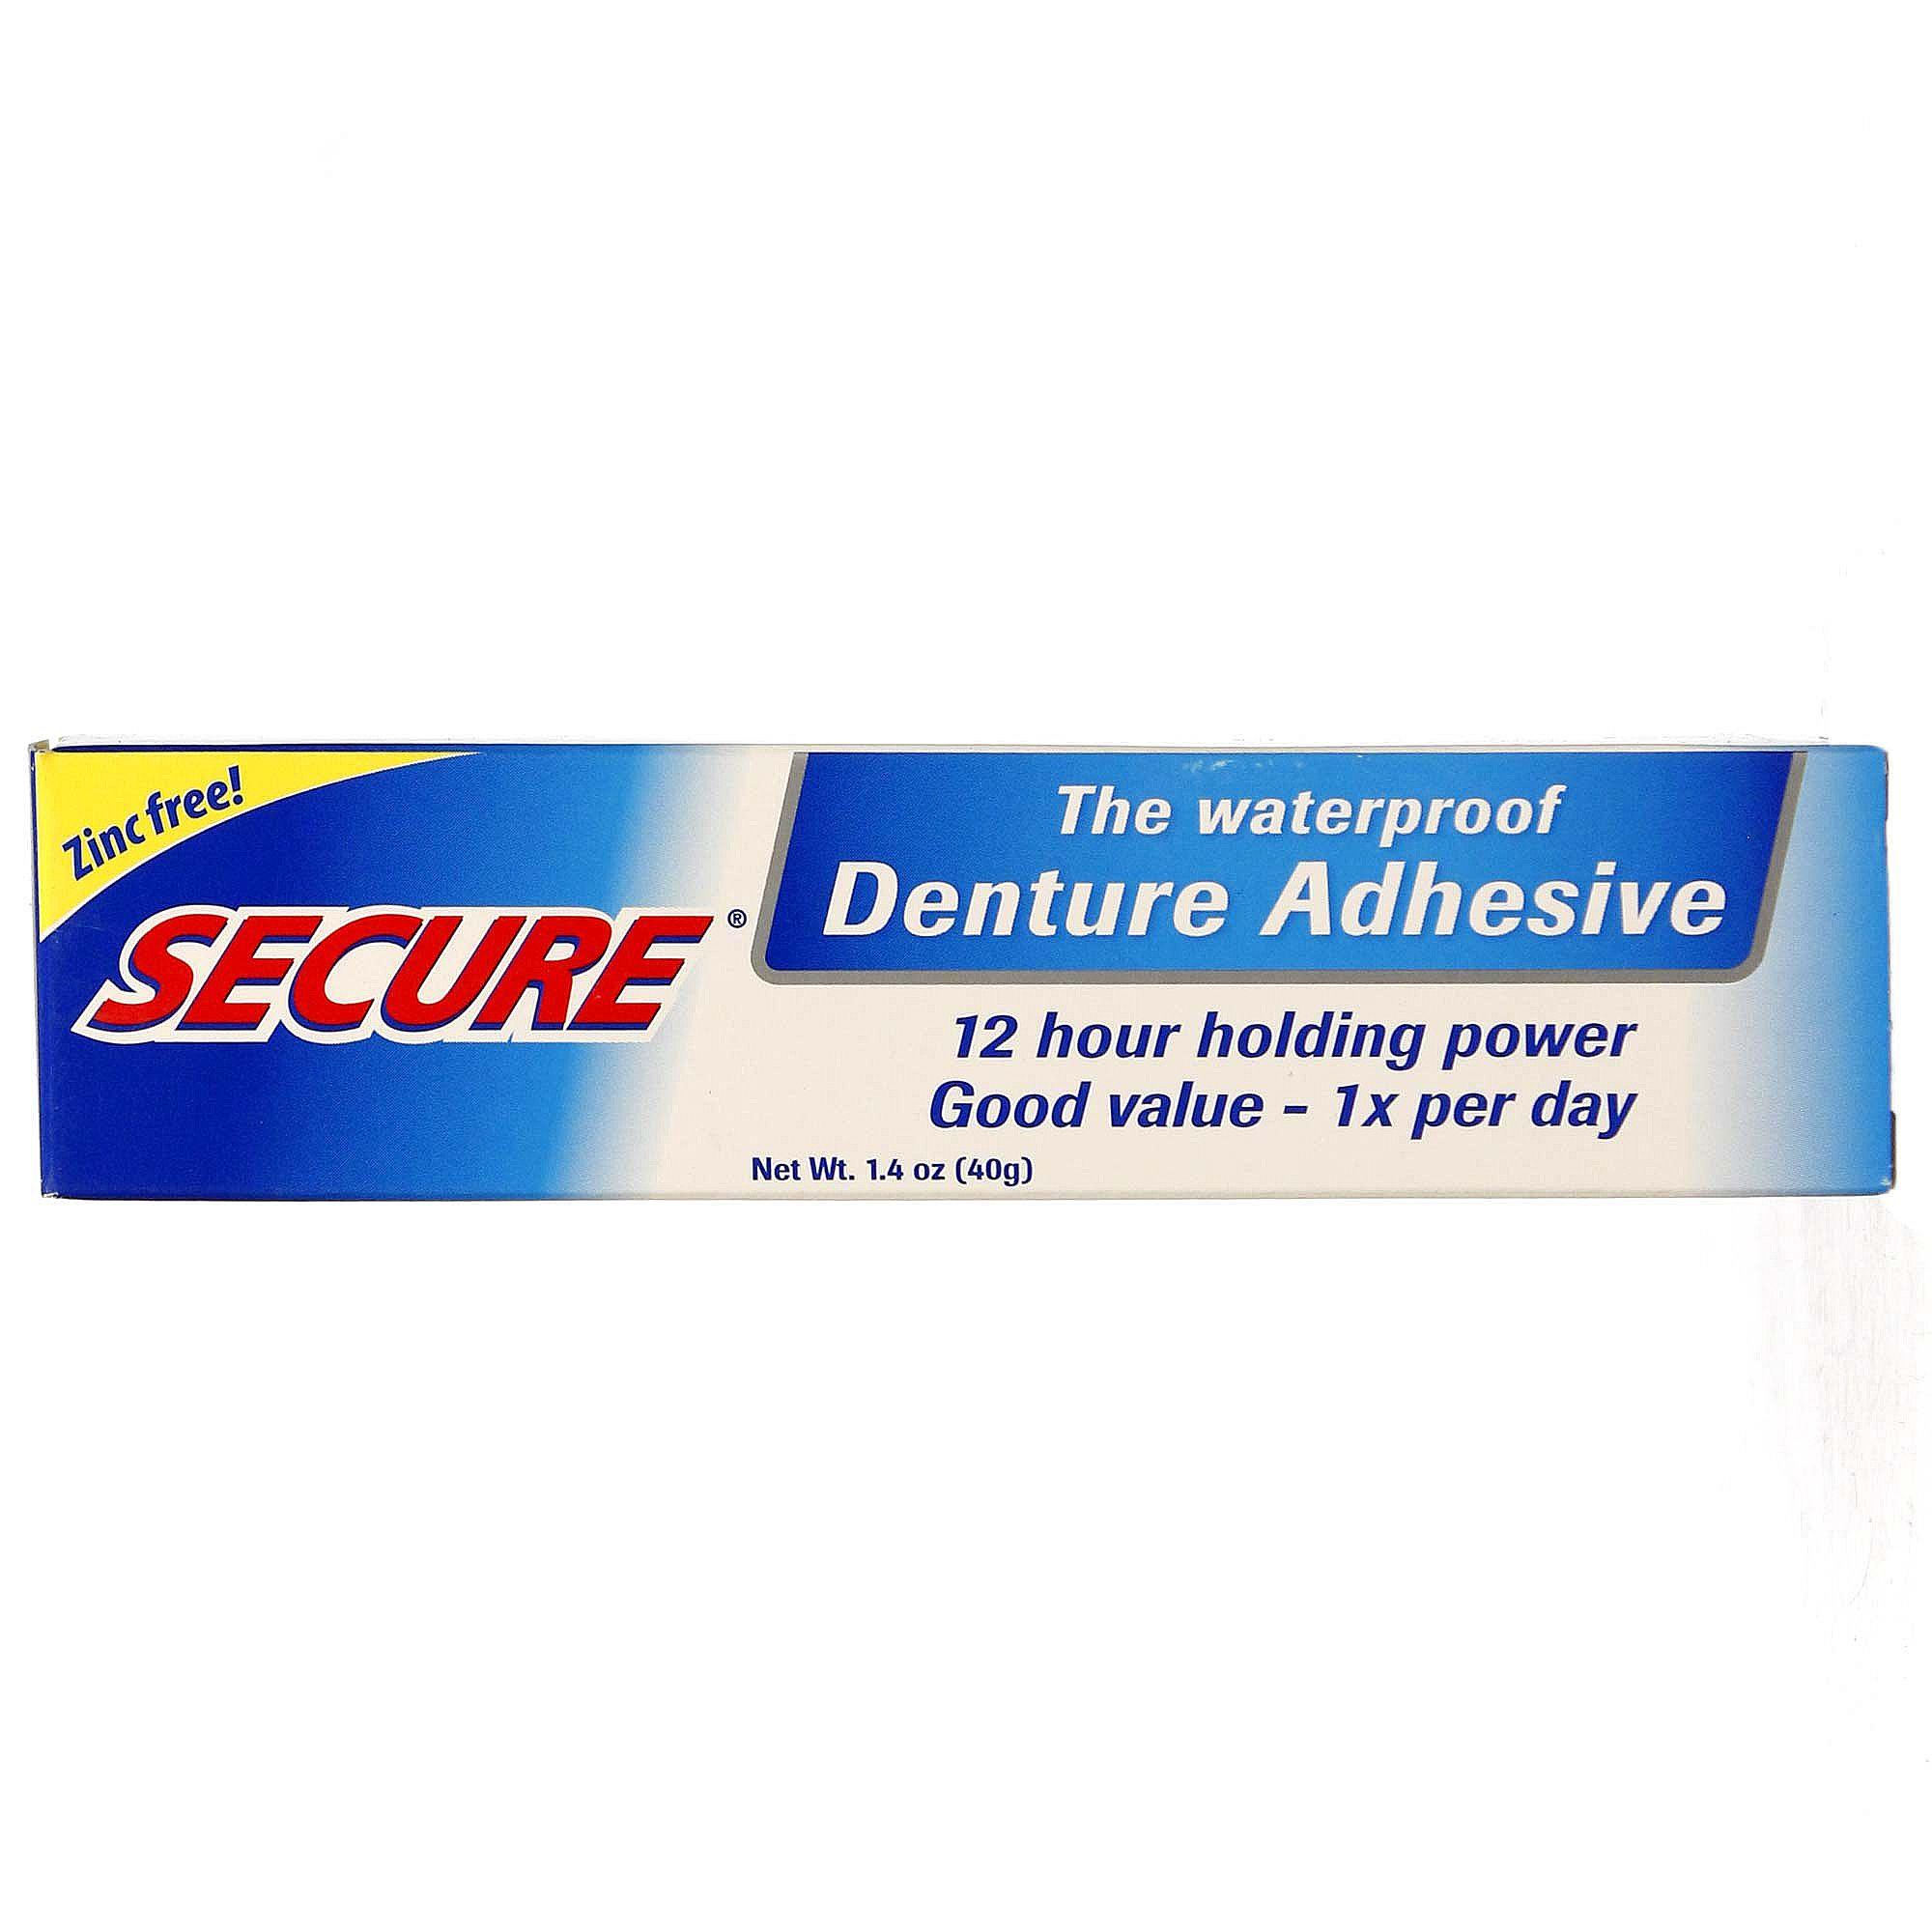 Secure Denture Adhesive >> A Vogel Secure Denture Adhesive 1 4 Oz